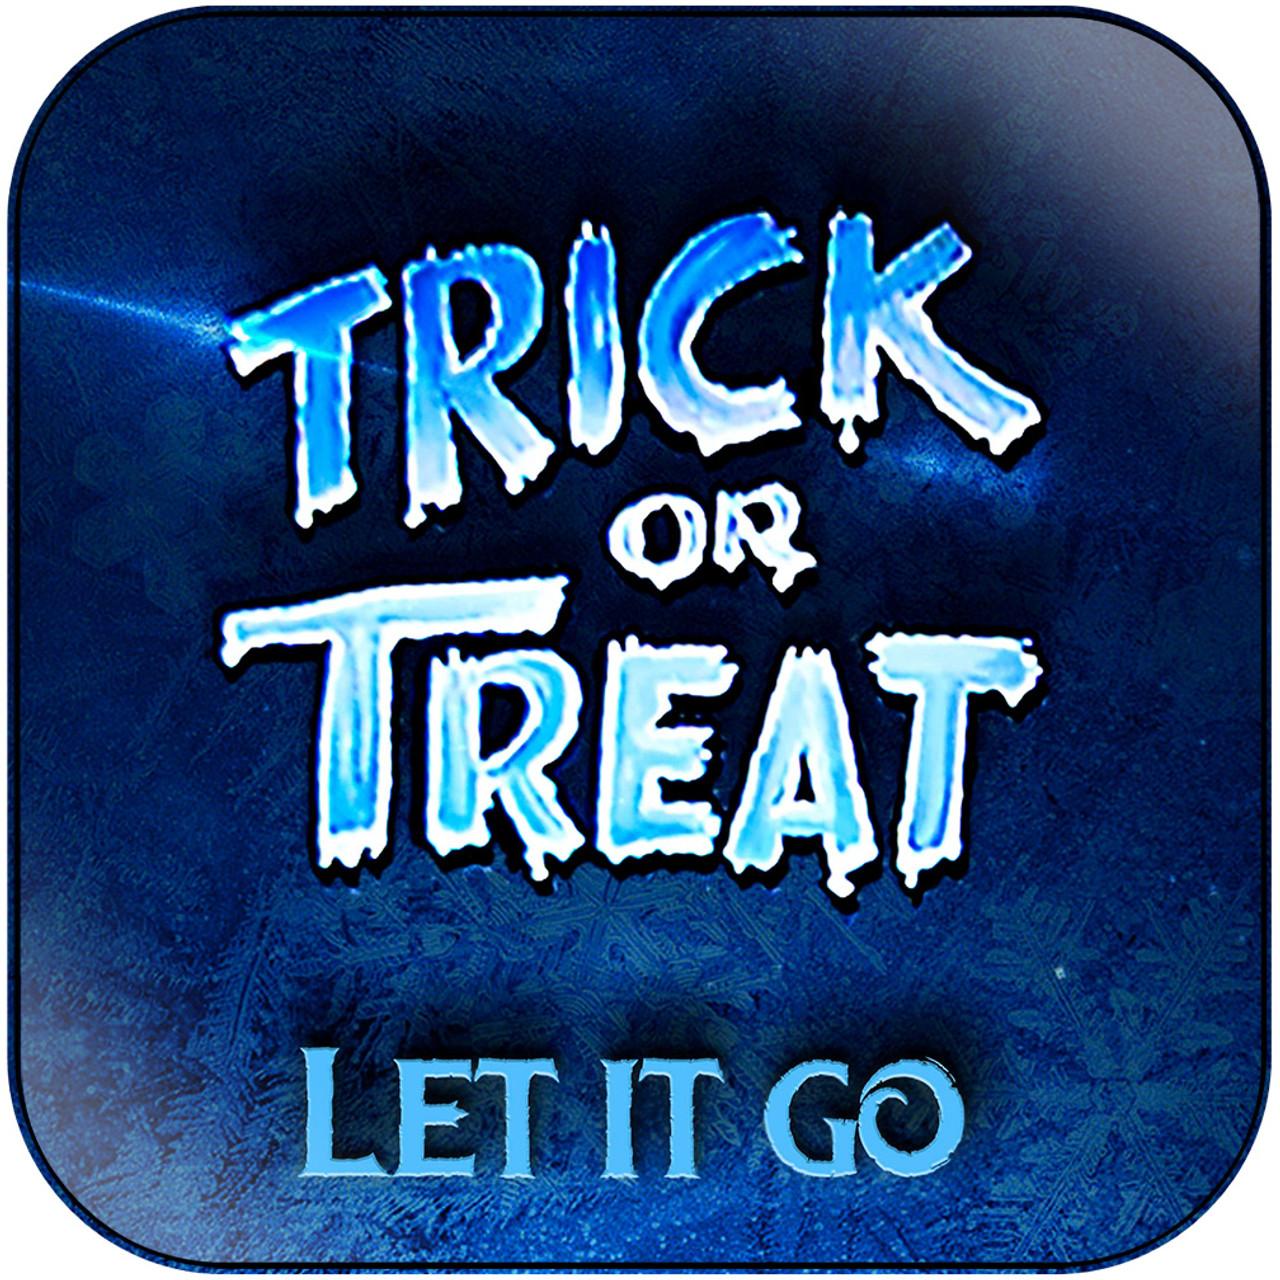 Trick or Treat - Let It Go Album Cover Sticker